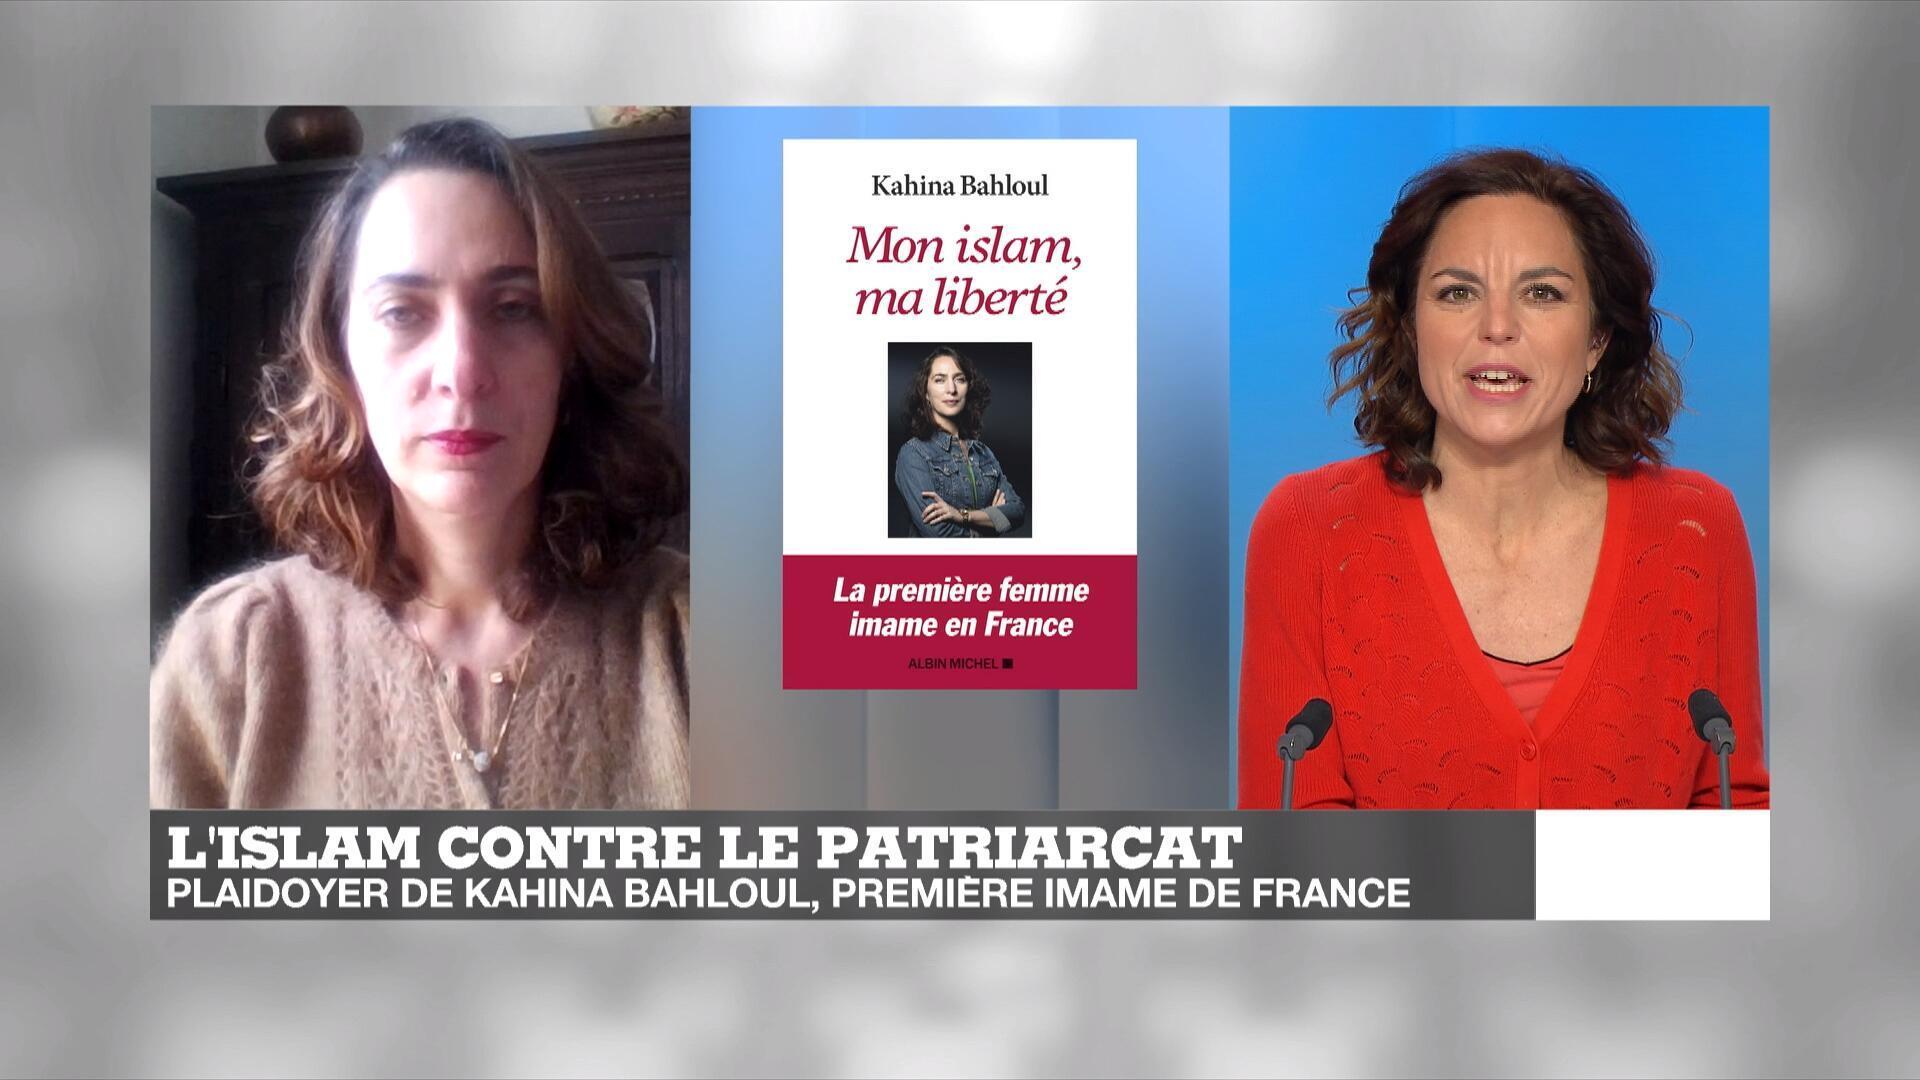 L'islam contre le patriarcat